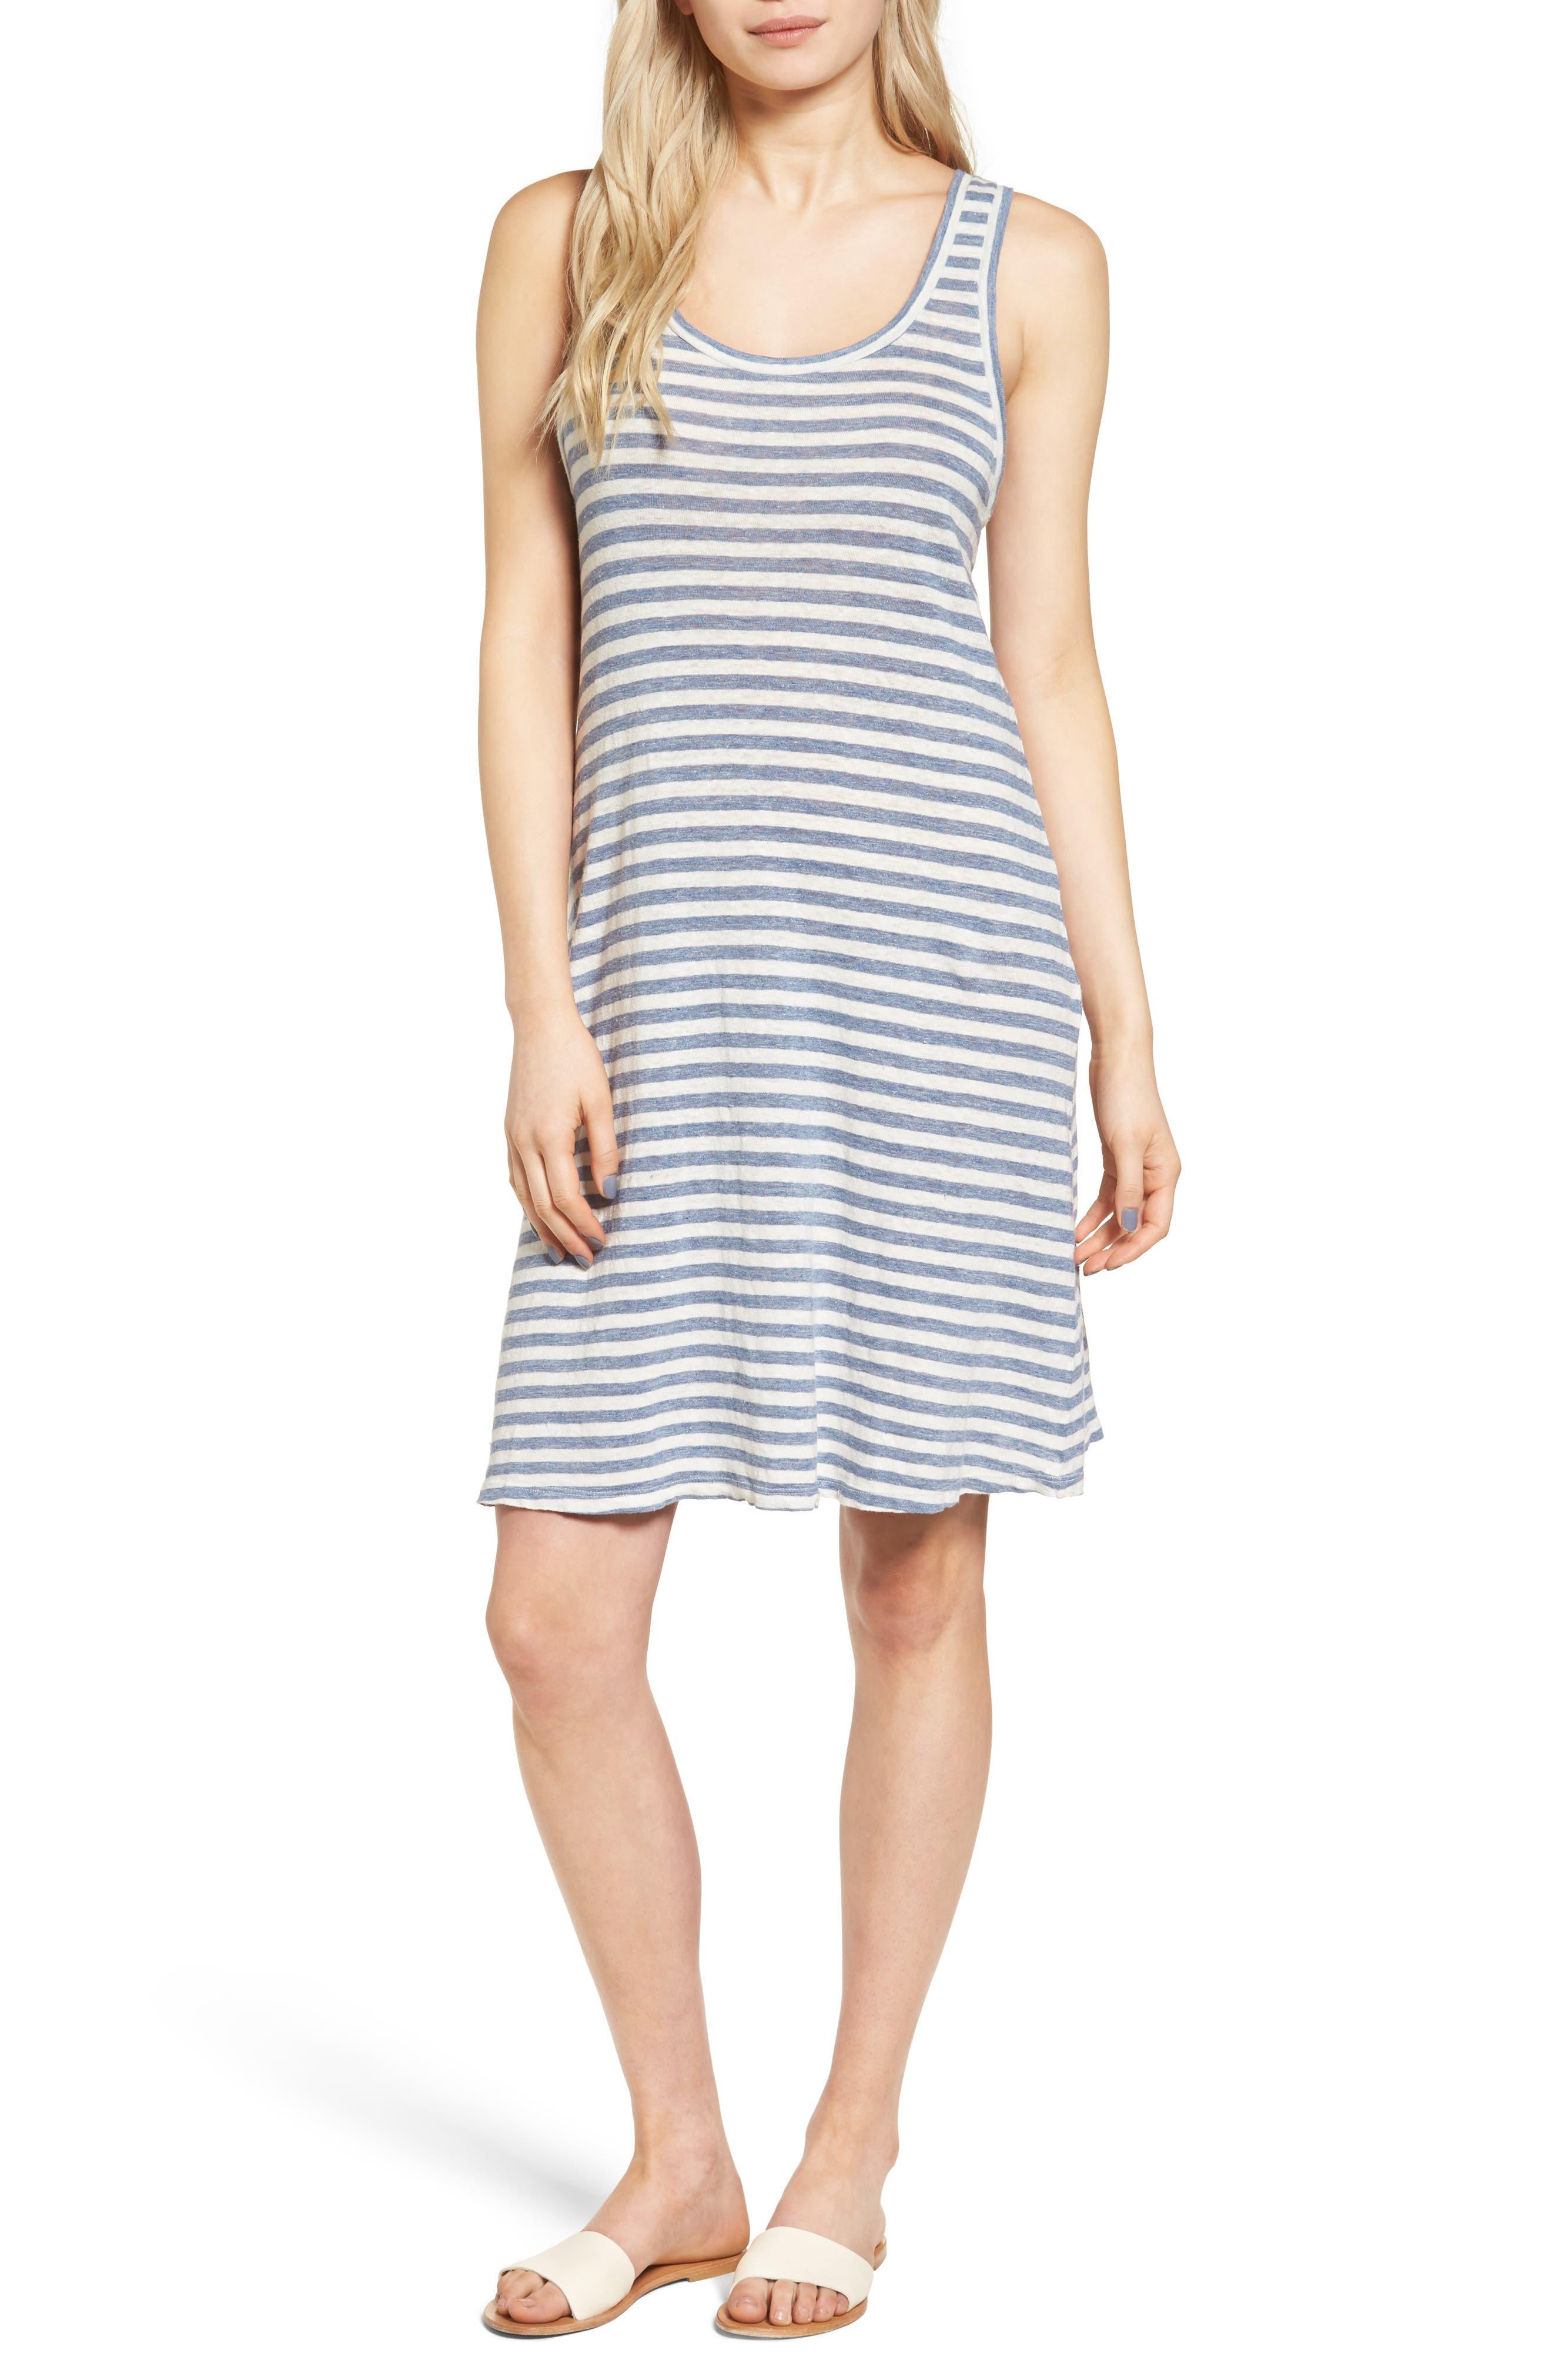 Avril Linen Tank Dress,                         Main,                         color, Heather Blue/ Powder White